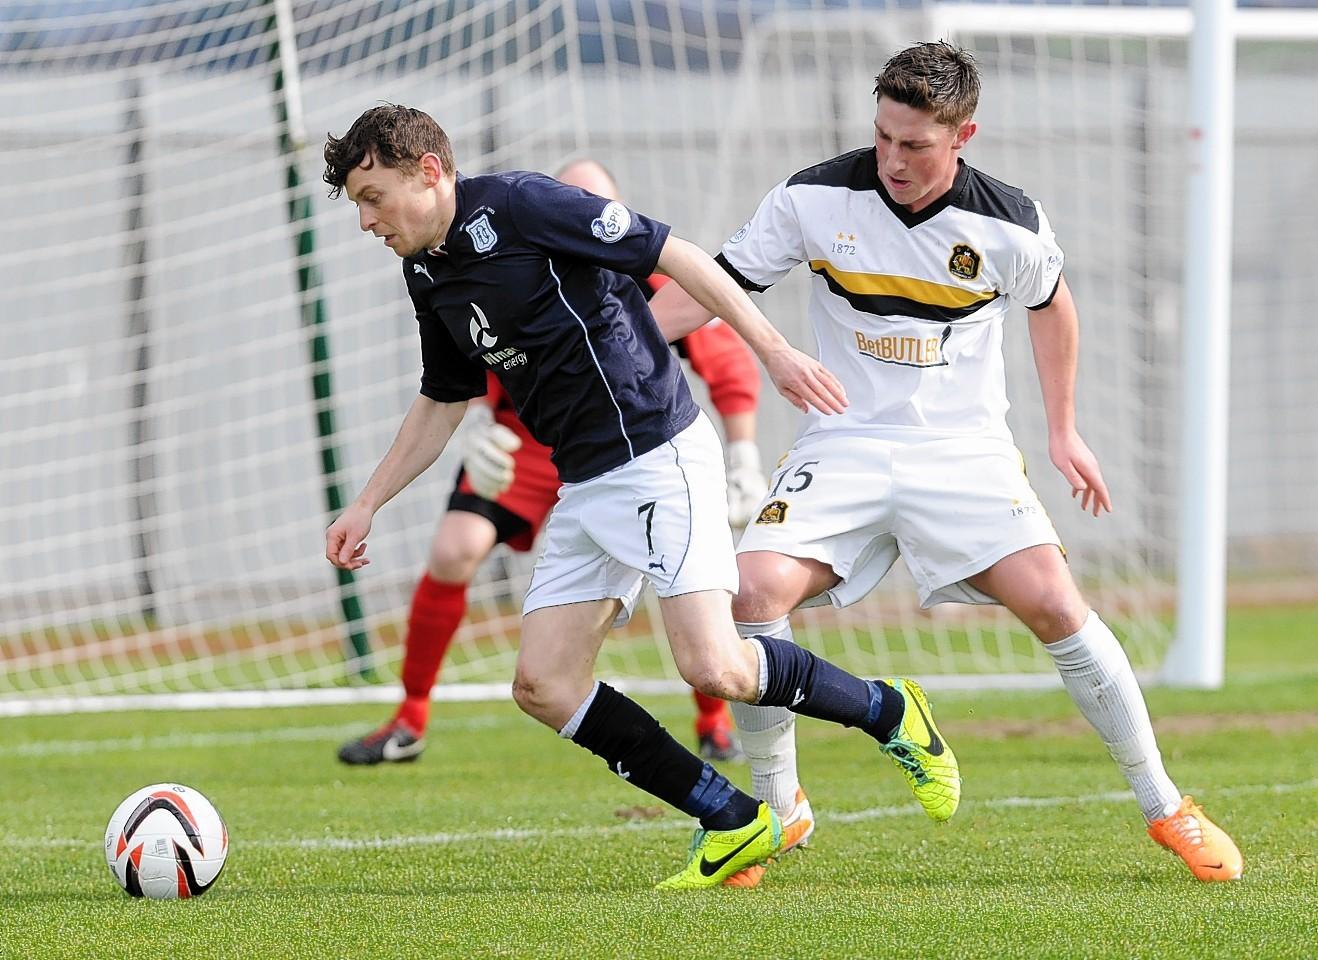 Nicky Riley in action last season against Dumbarton's Jordan Kirkpatrick